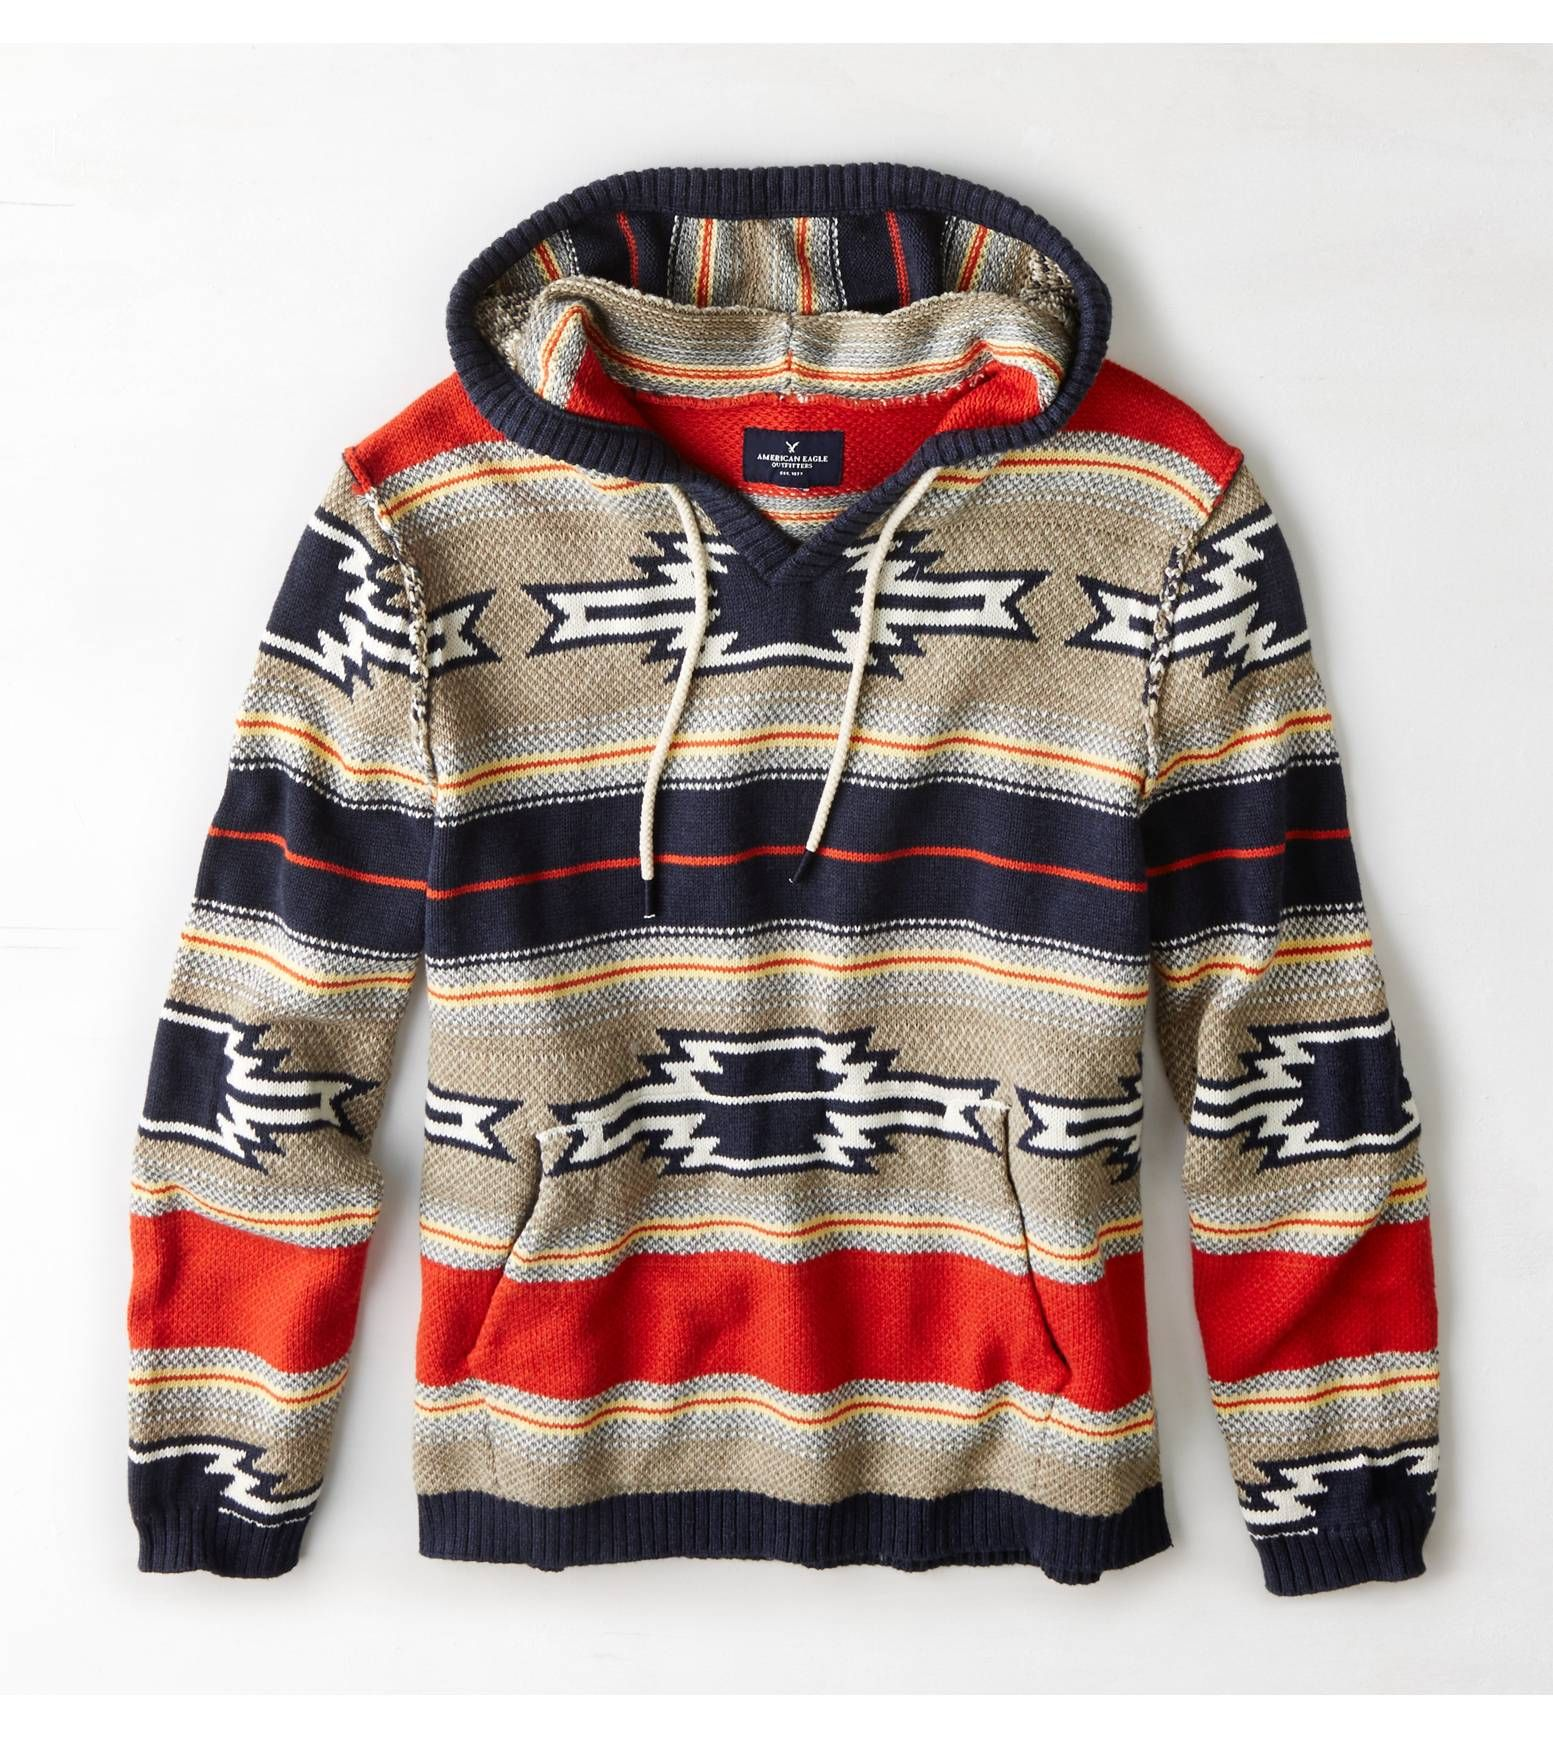 Aeo Baja Hoodie Multi American Eagle Outfitters Desire Clothing Clothes Hoodies [ 1739 x 1553 Pixel ]